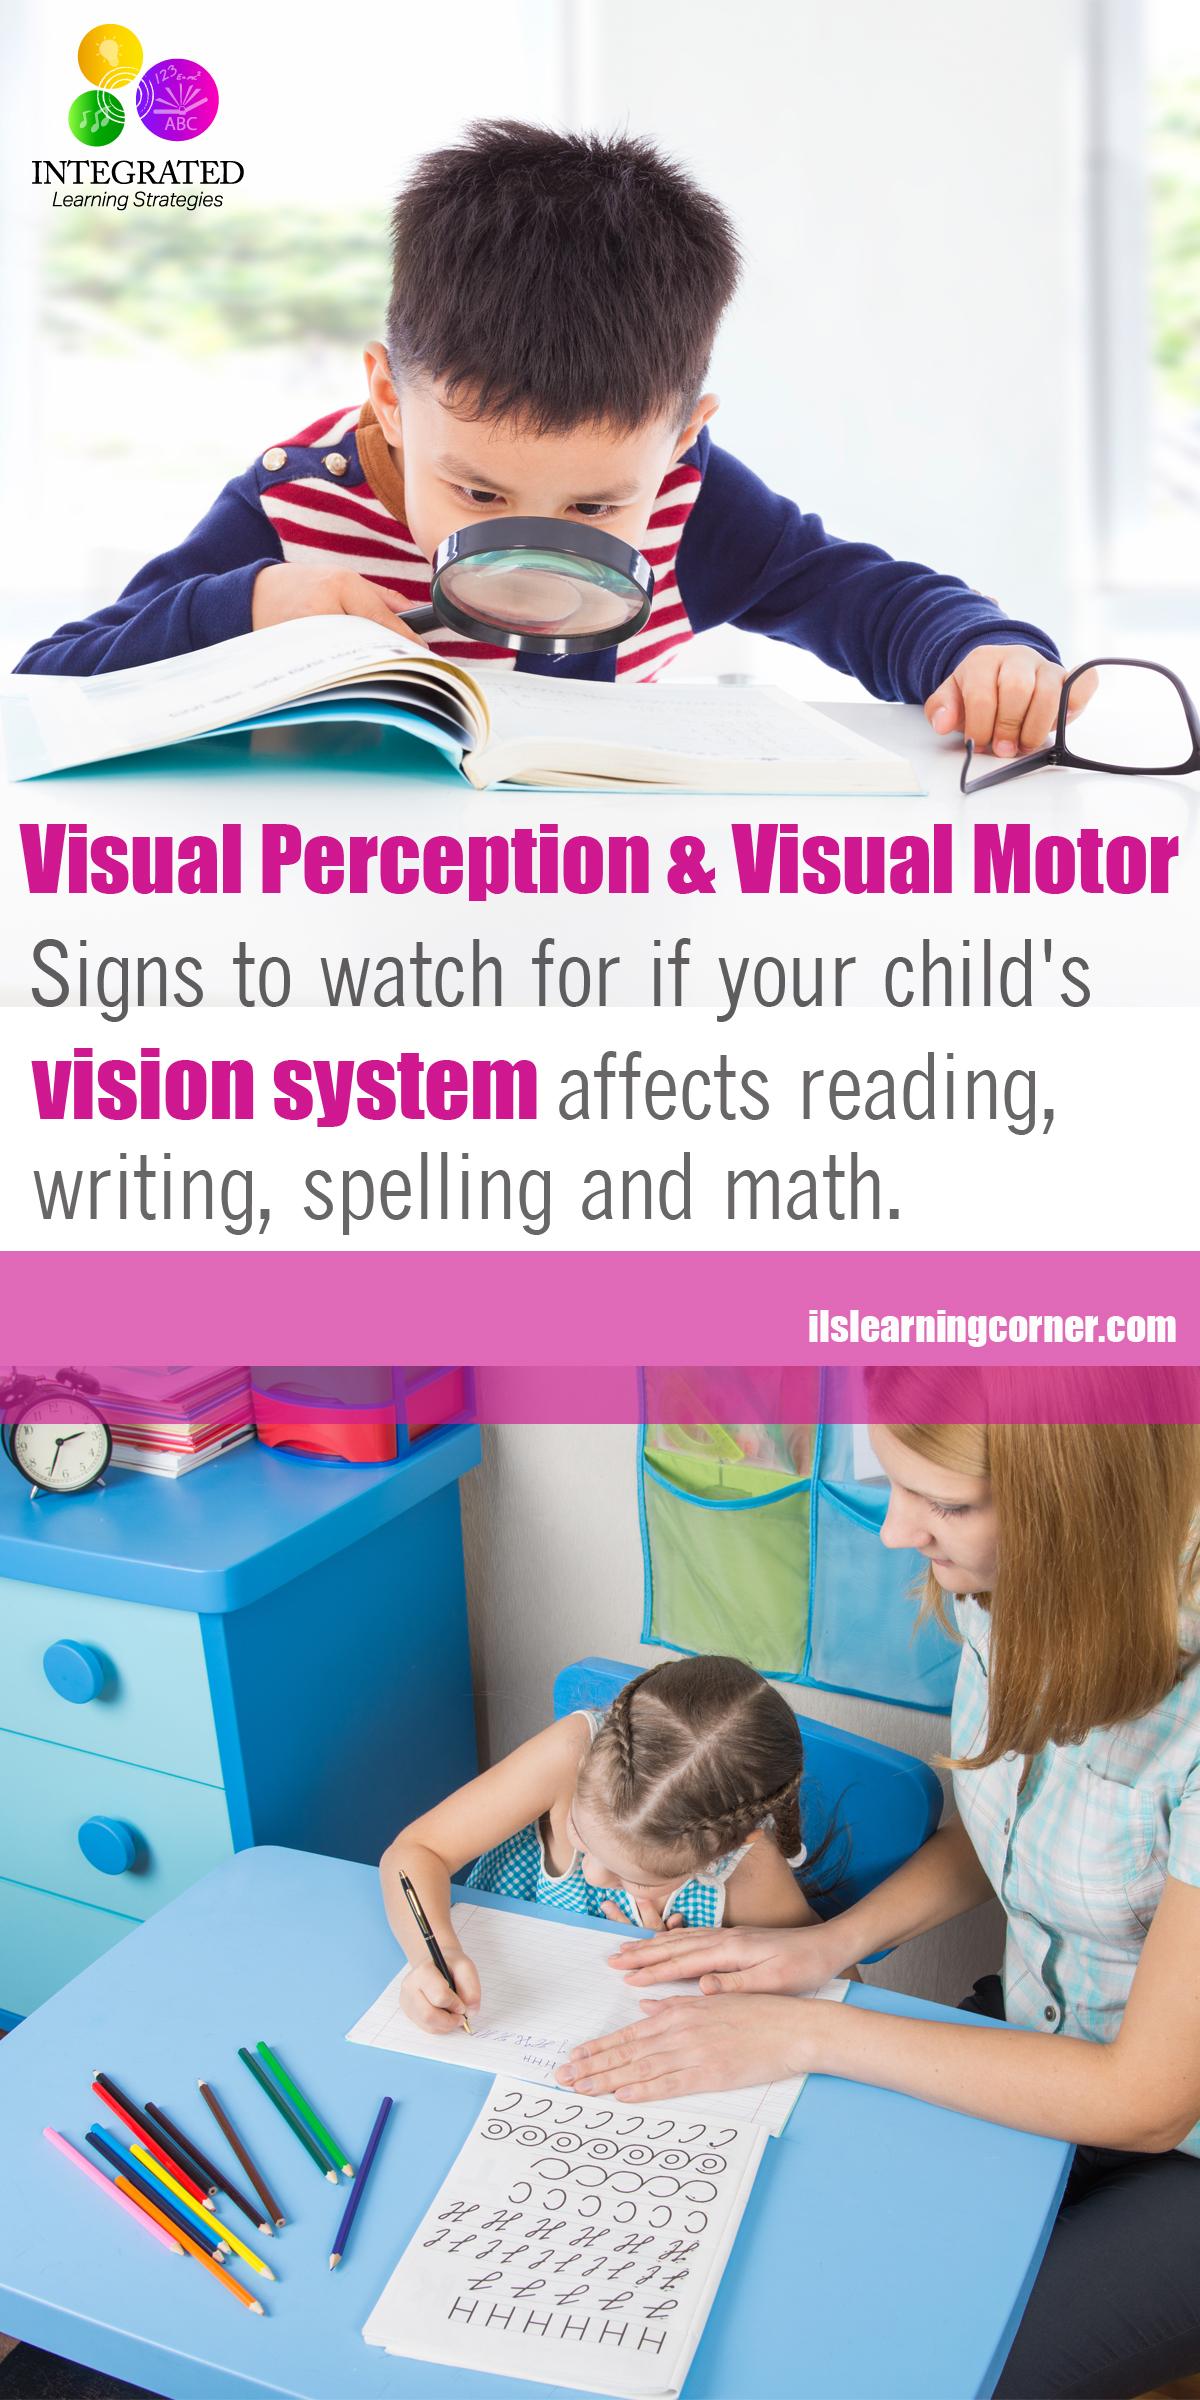 Visual Development Why Poor Visual Perception Skills Could Make Poor Readers